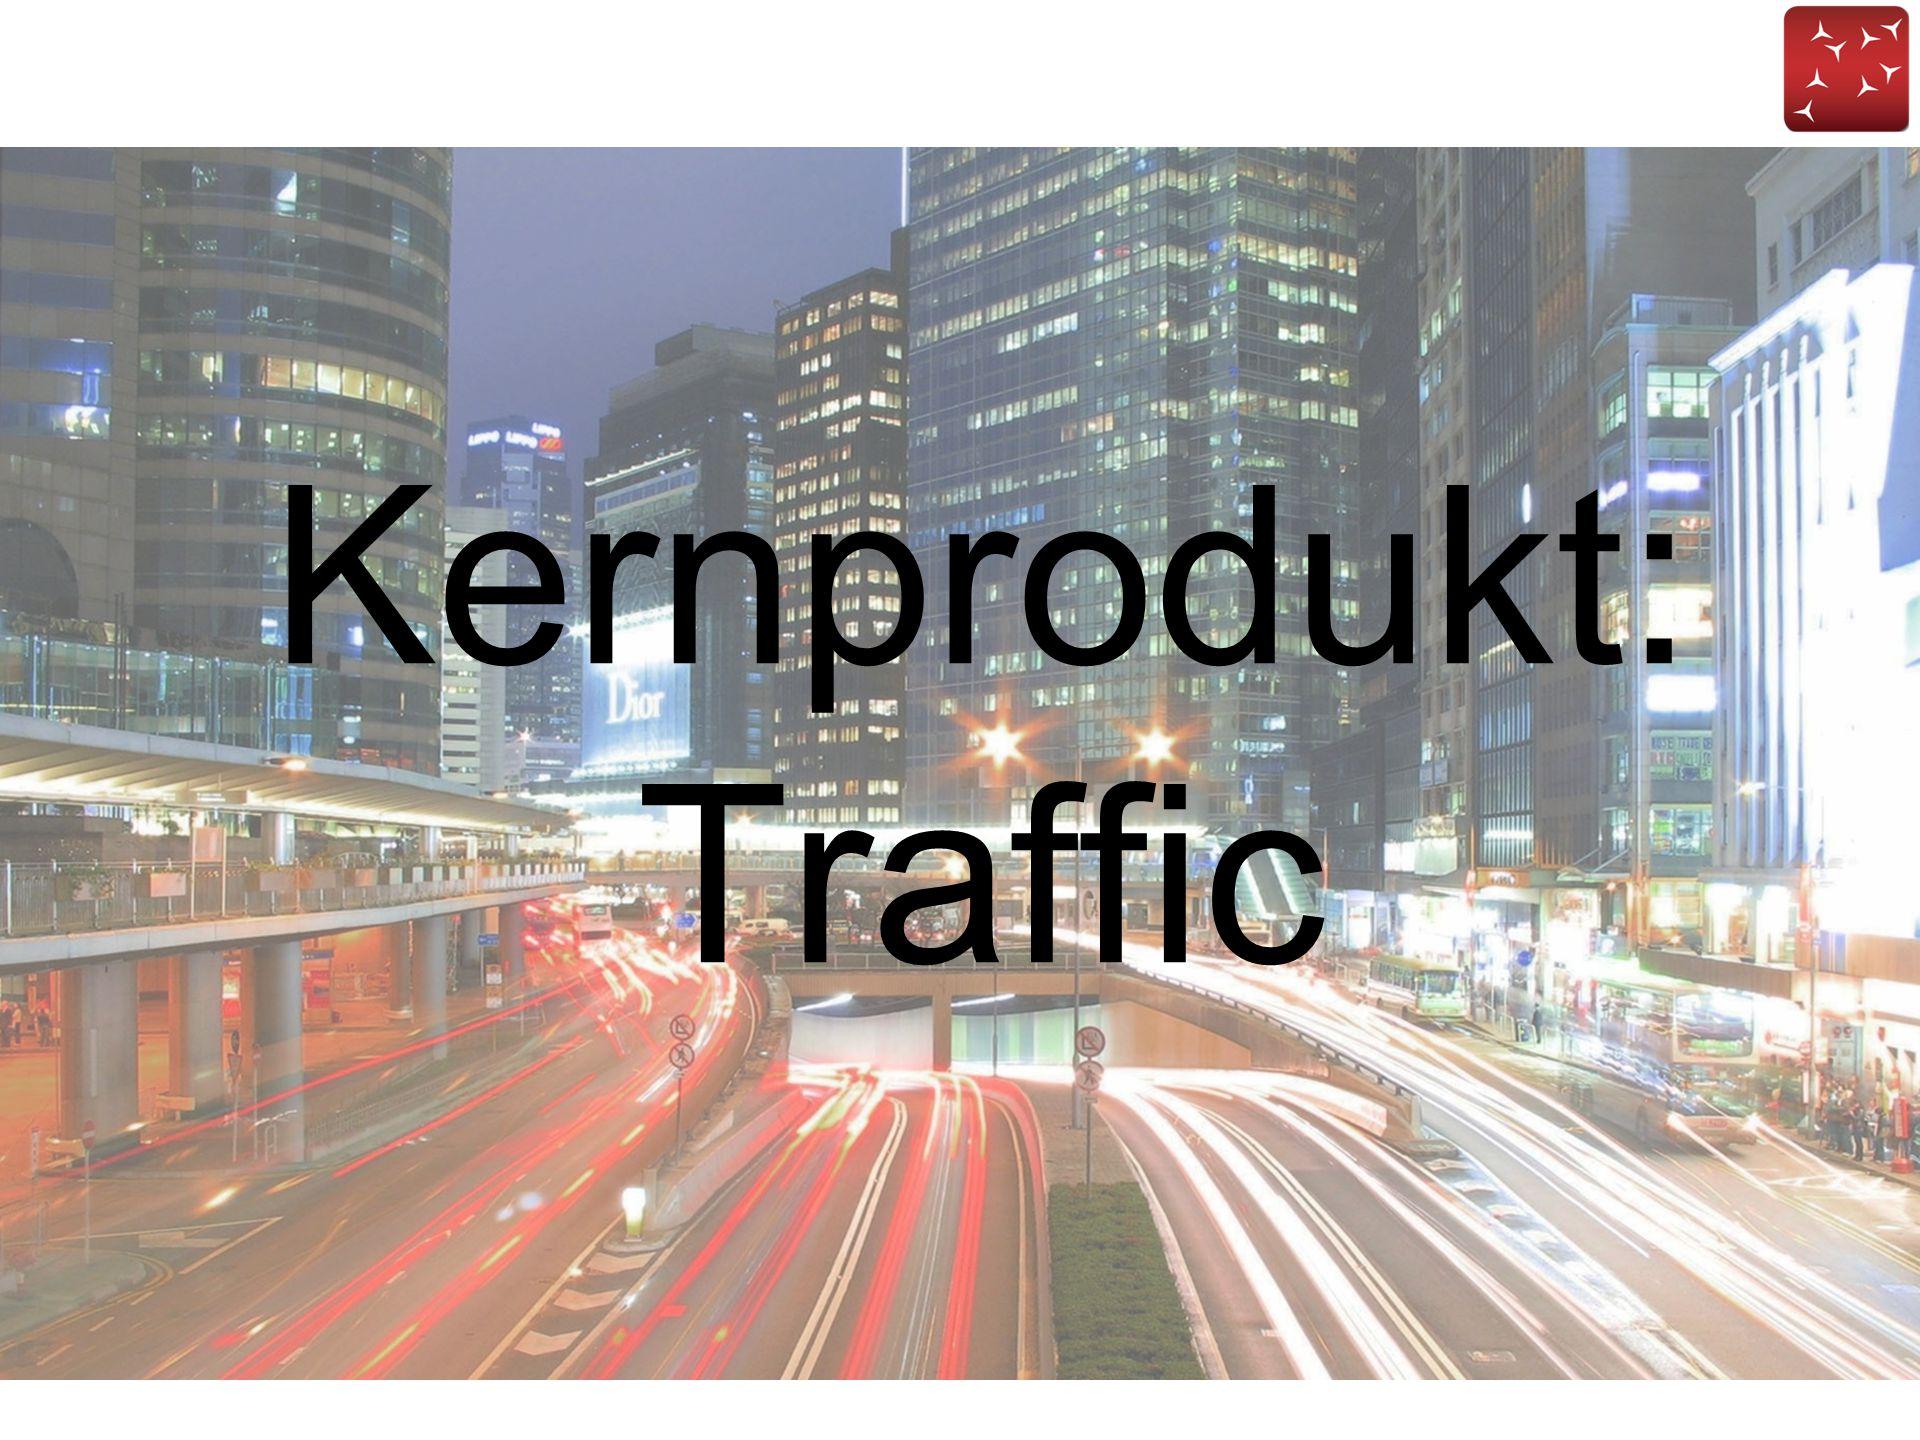 Kernprodukt: Traffic